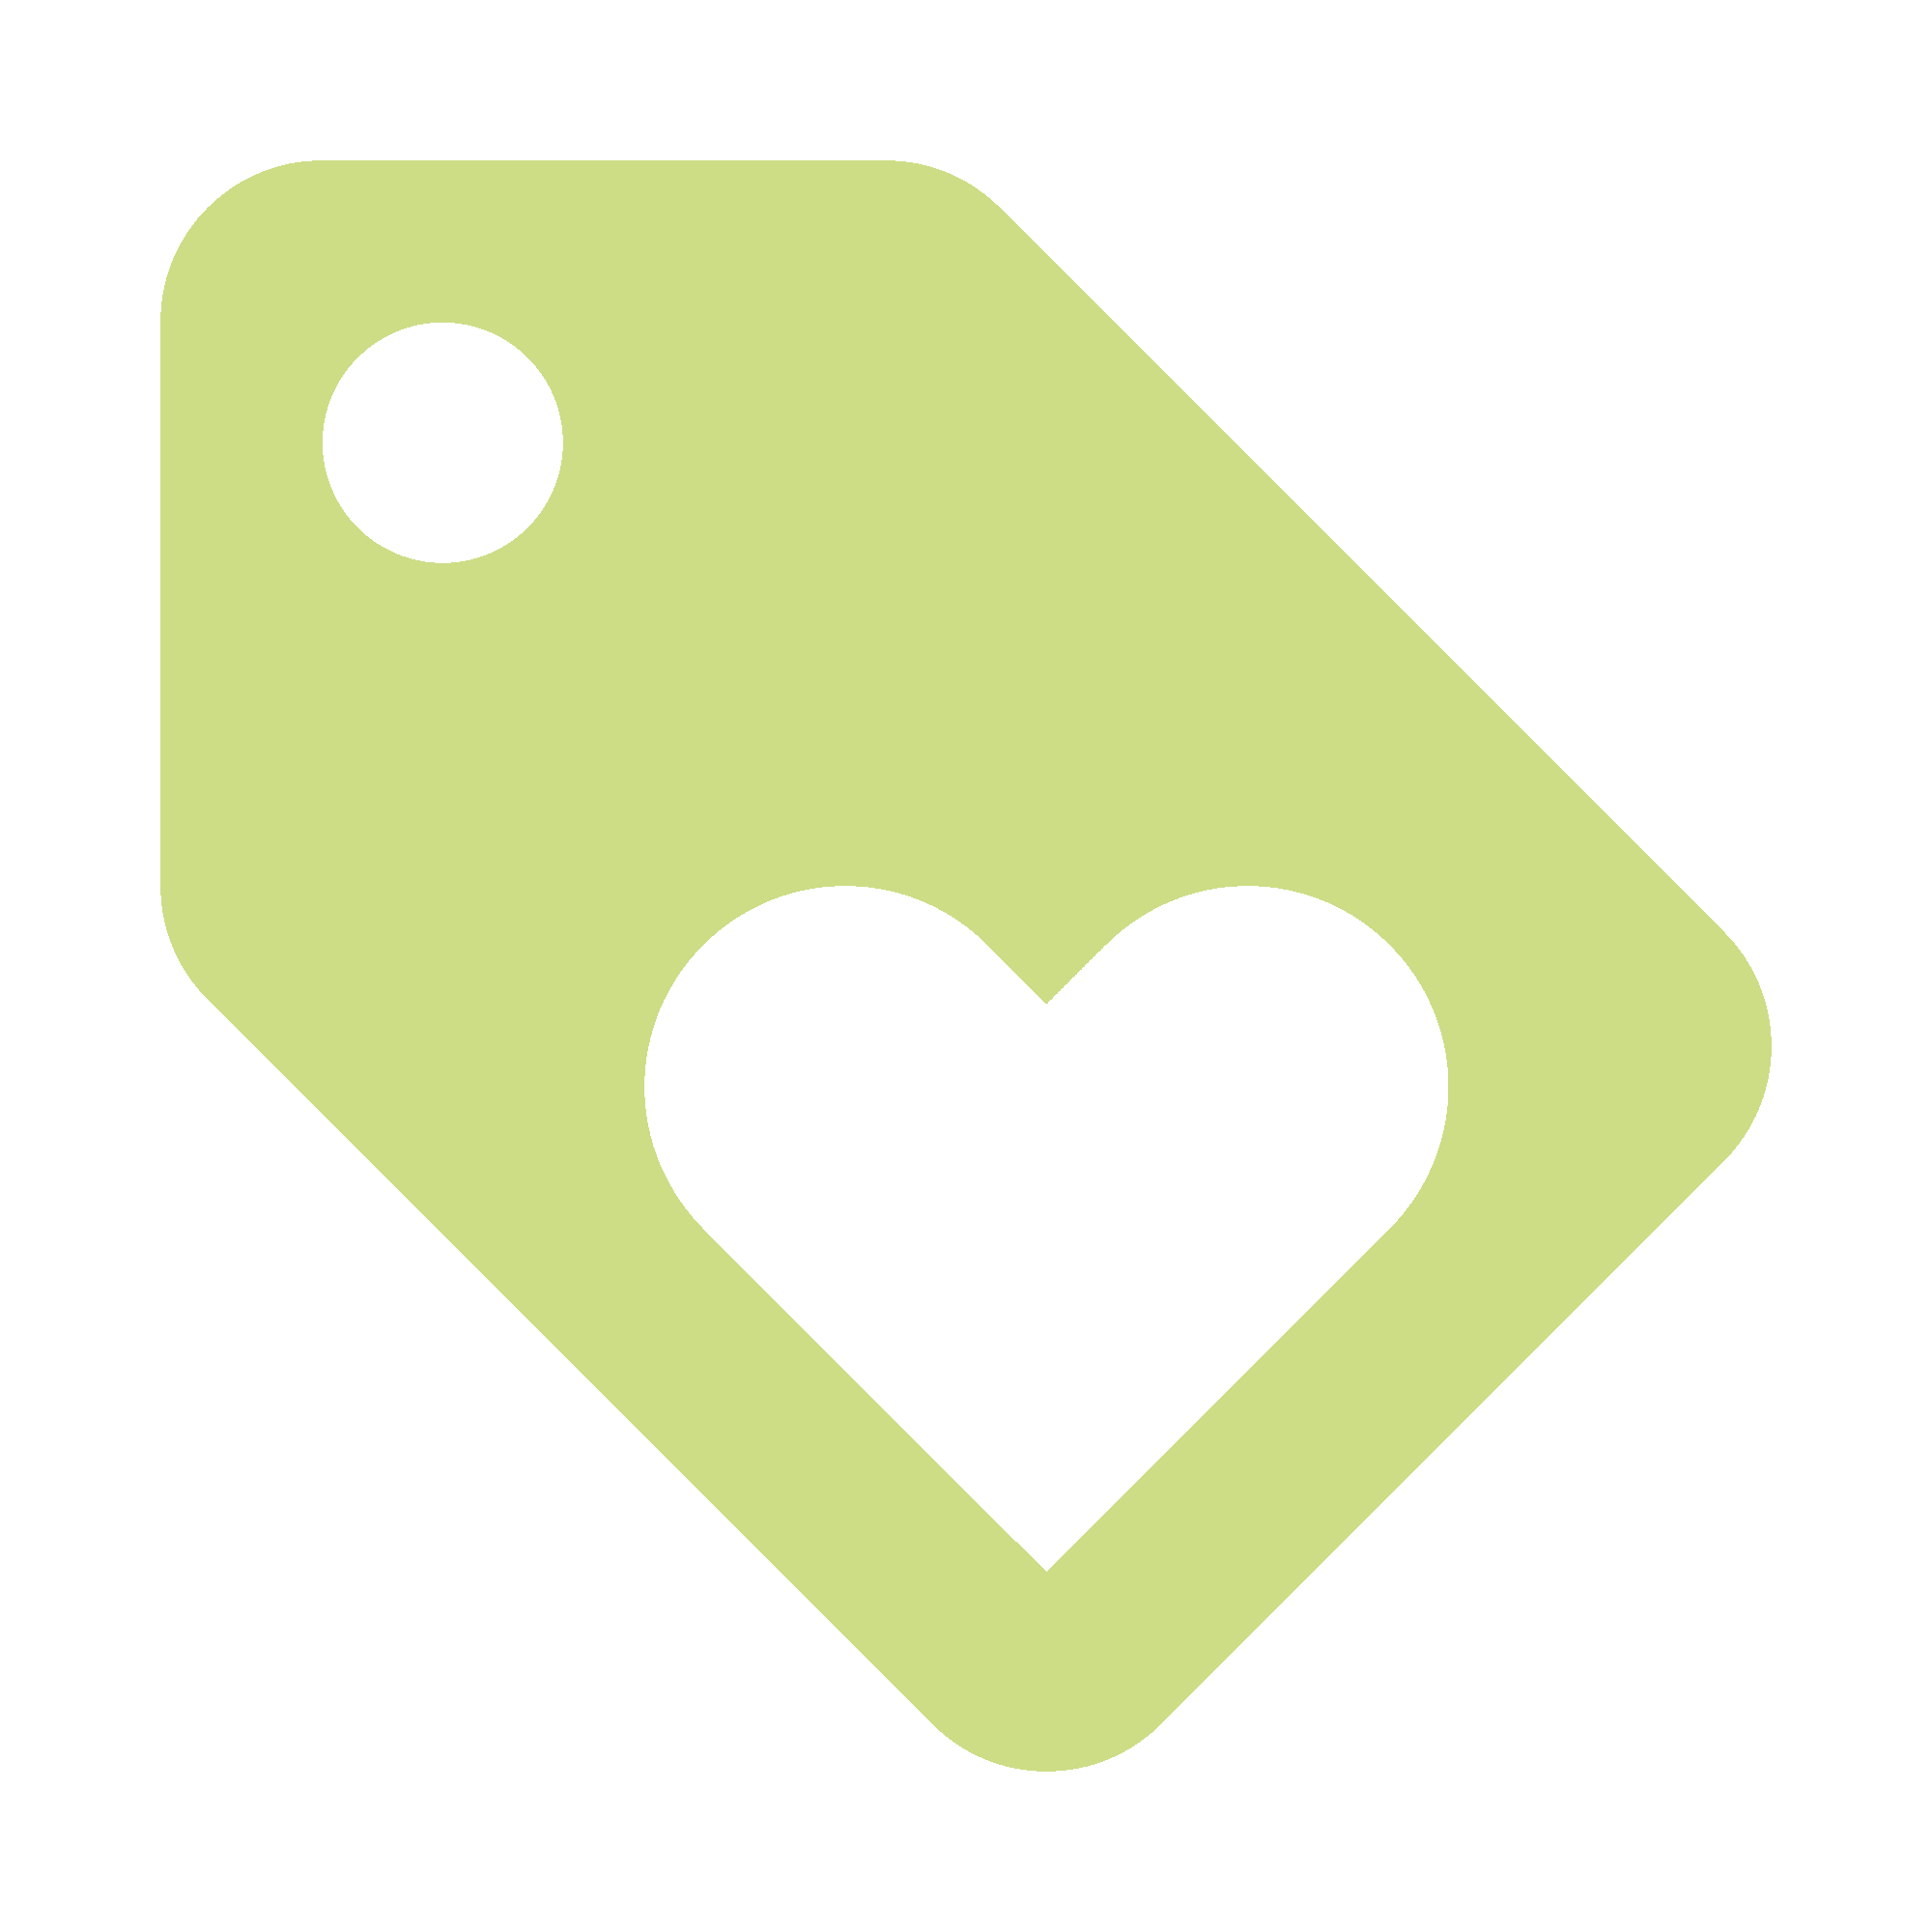 icone fidelite